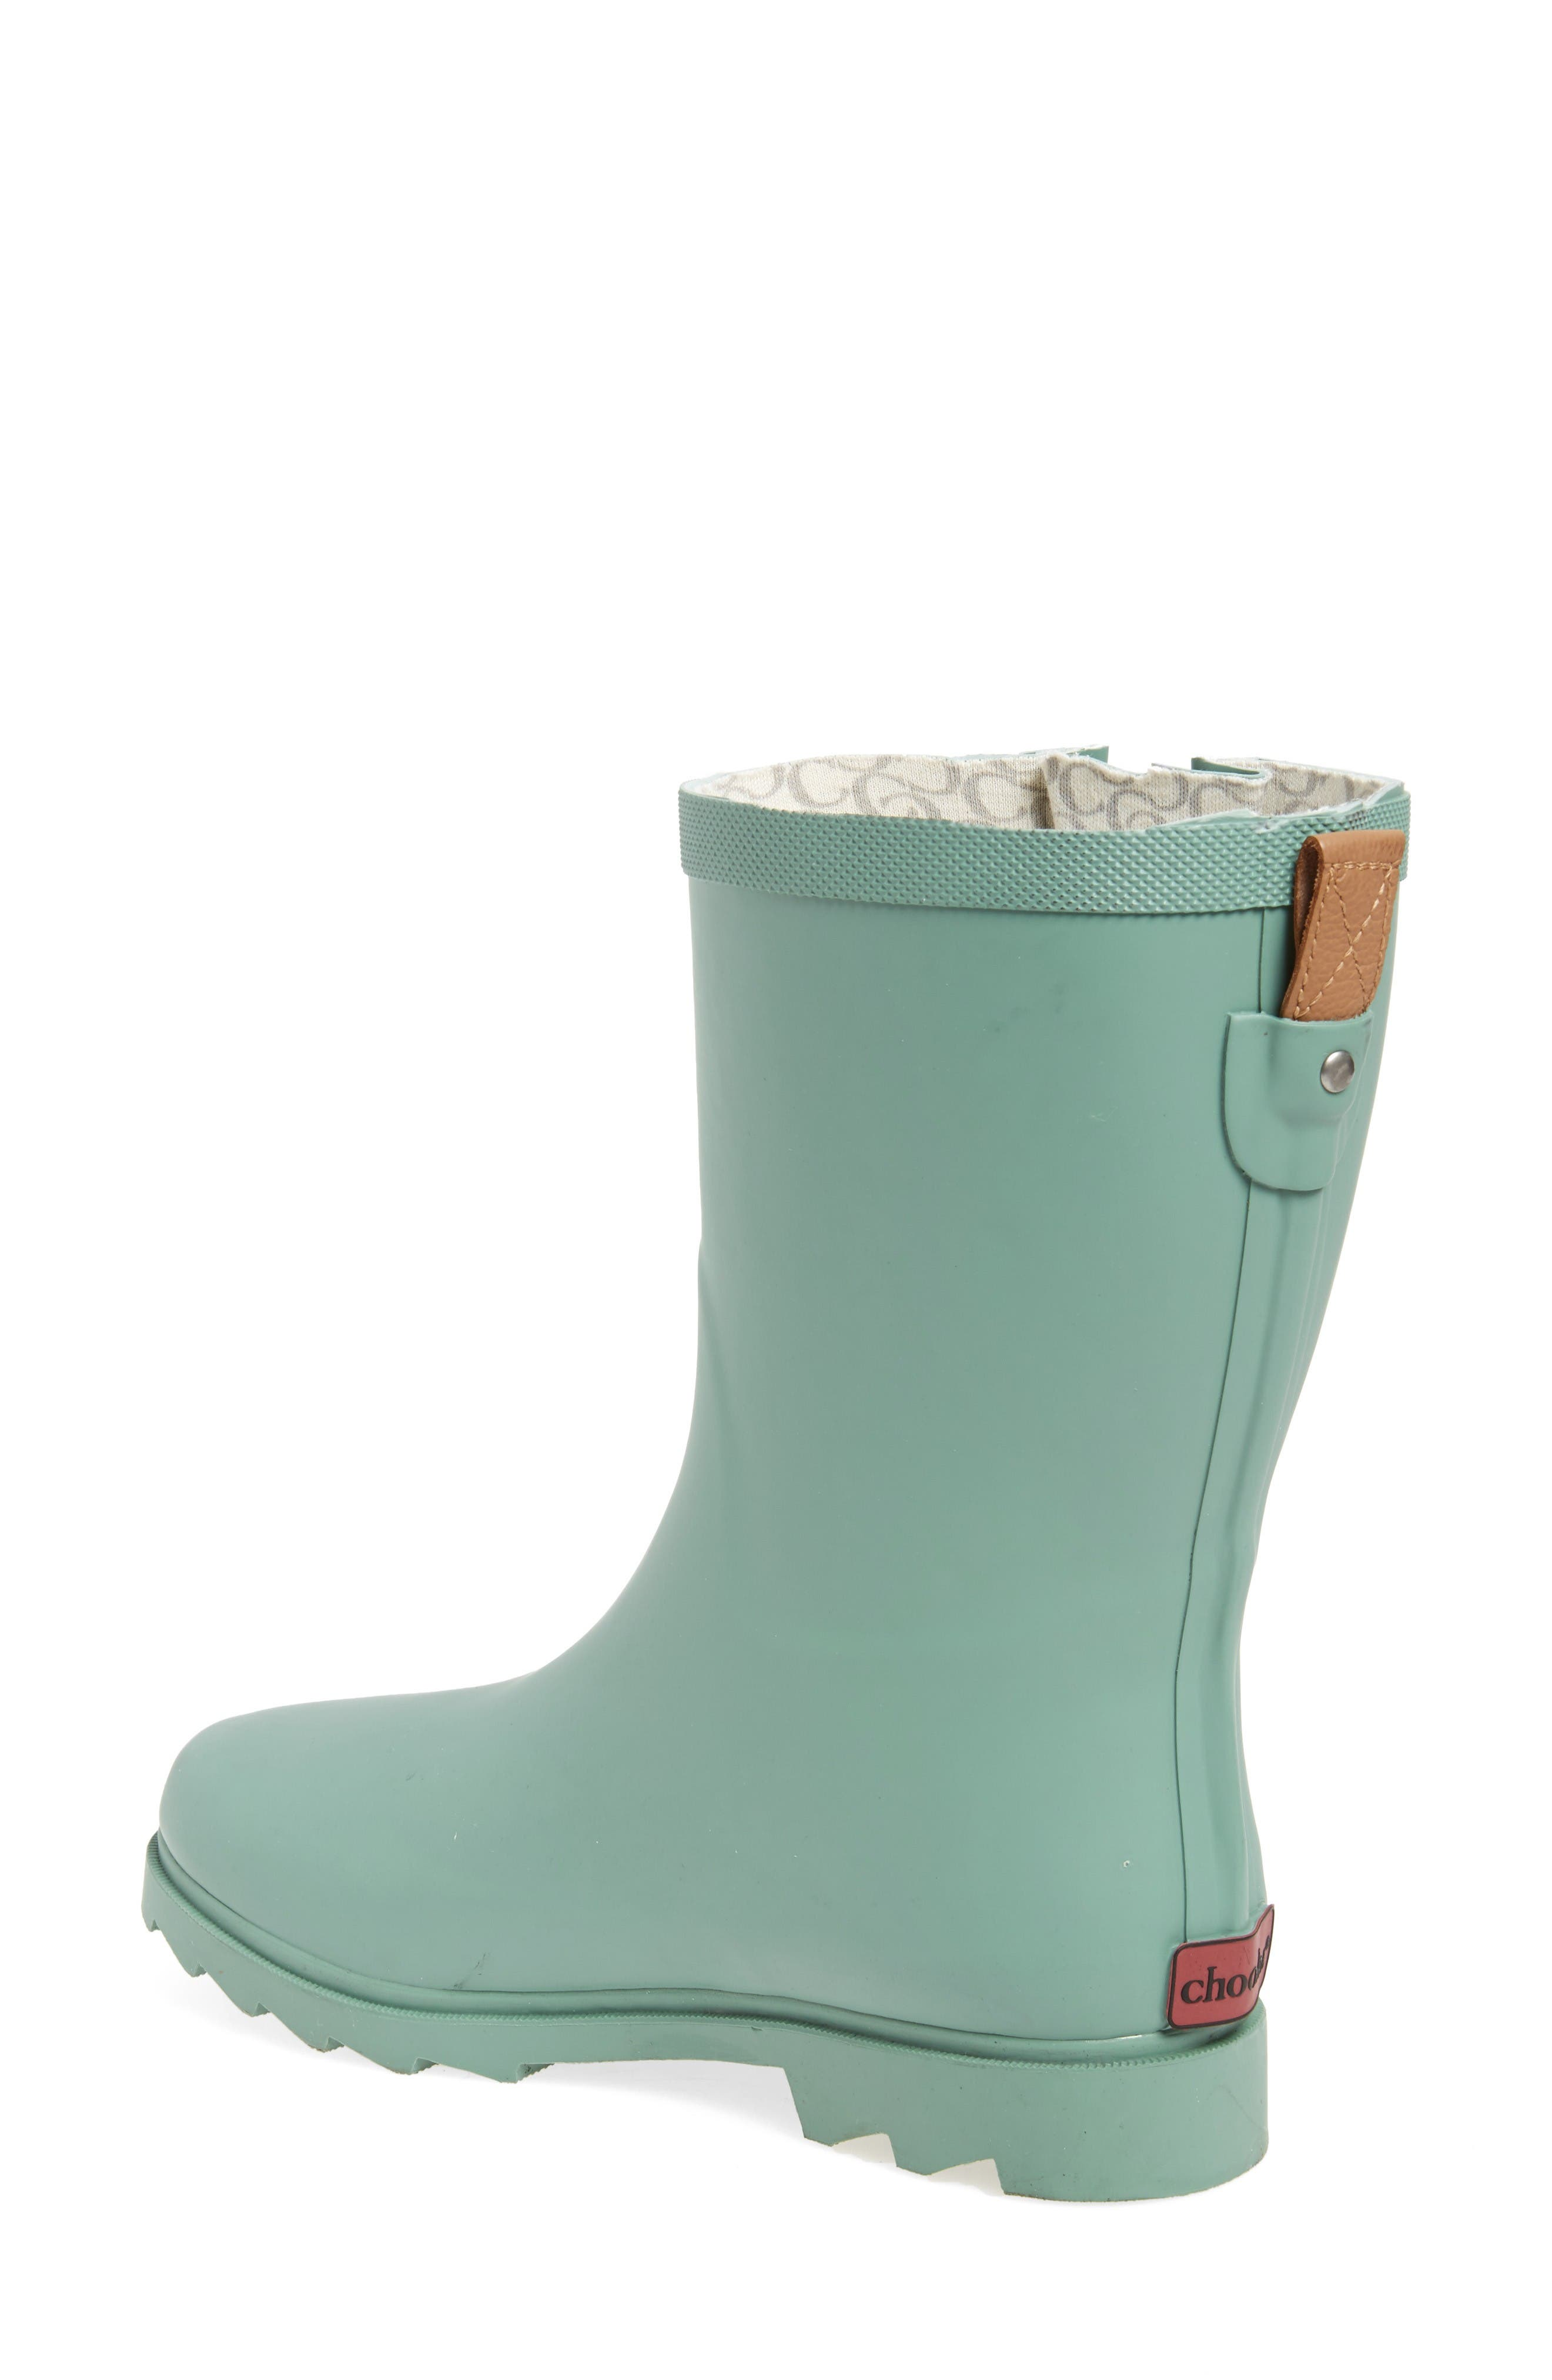 Alternate Image 2  - Chooka 'Top Solid Mid Height' Rain Boot (Women)